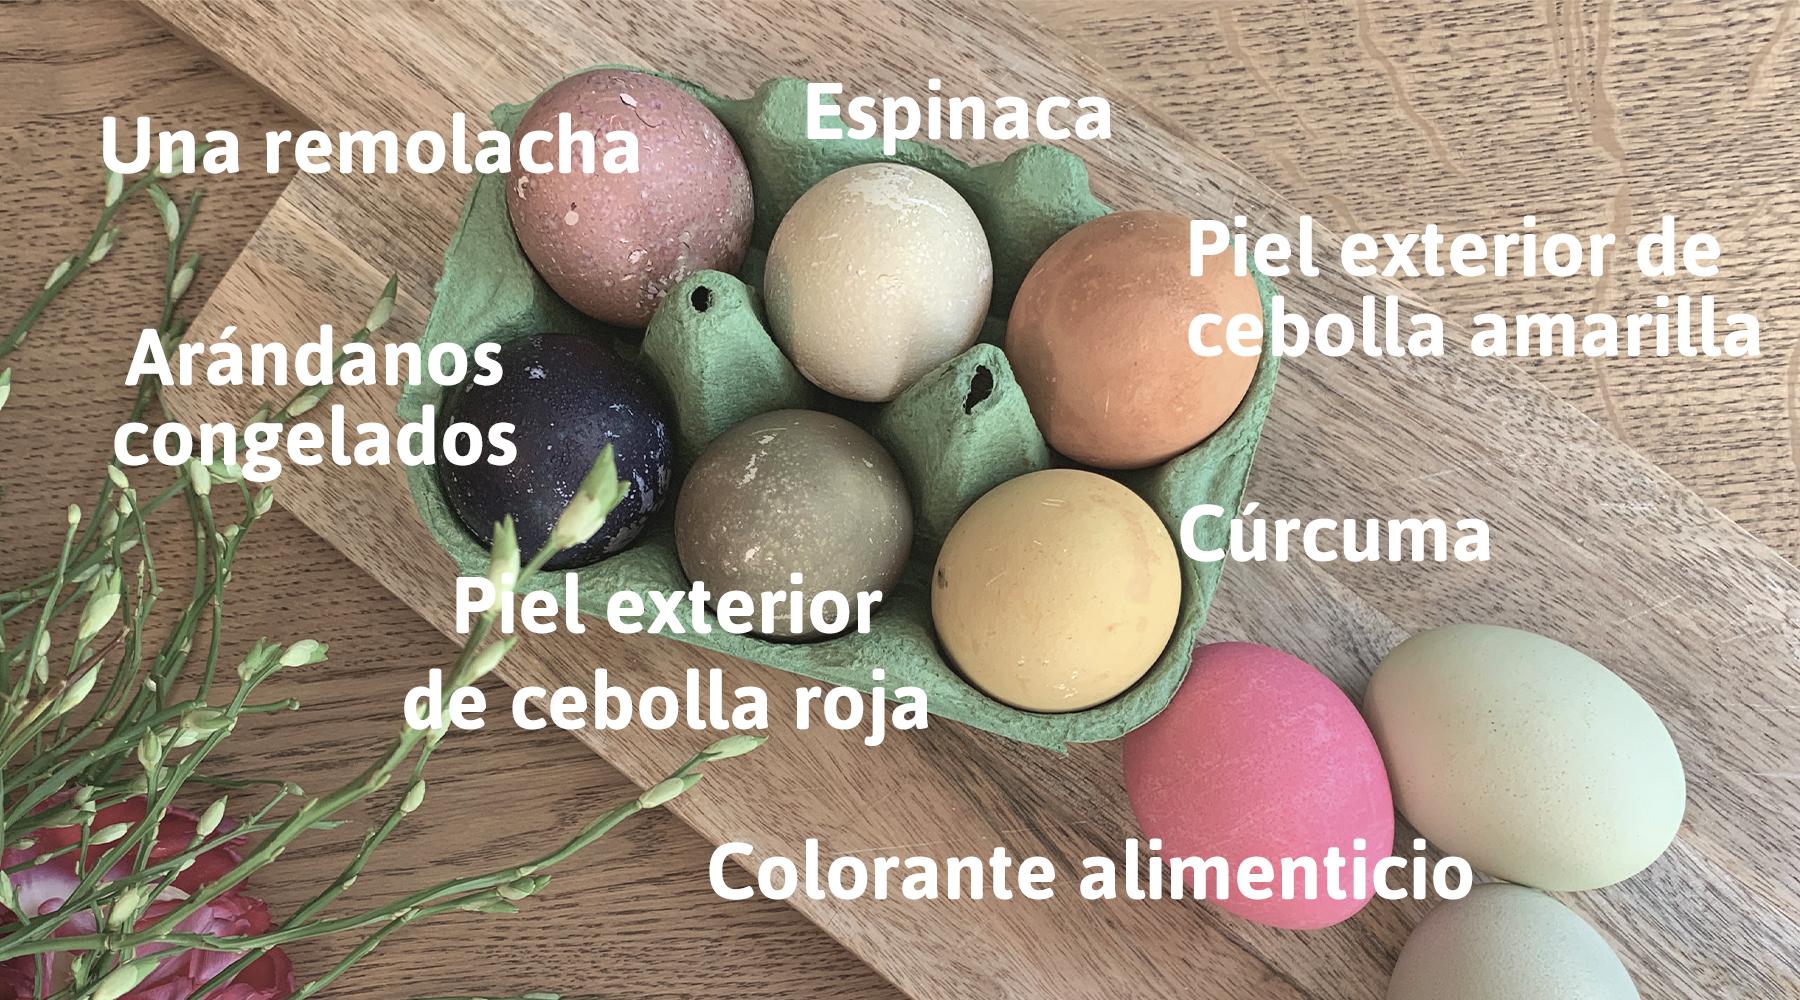 Para colorear huevos de forma natural